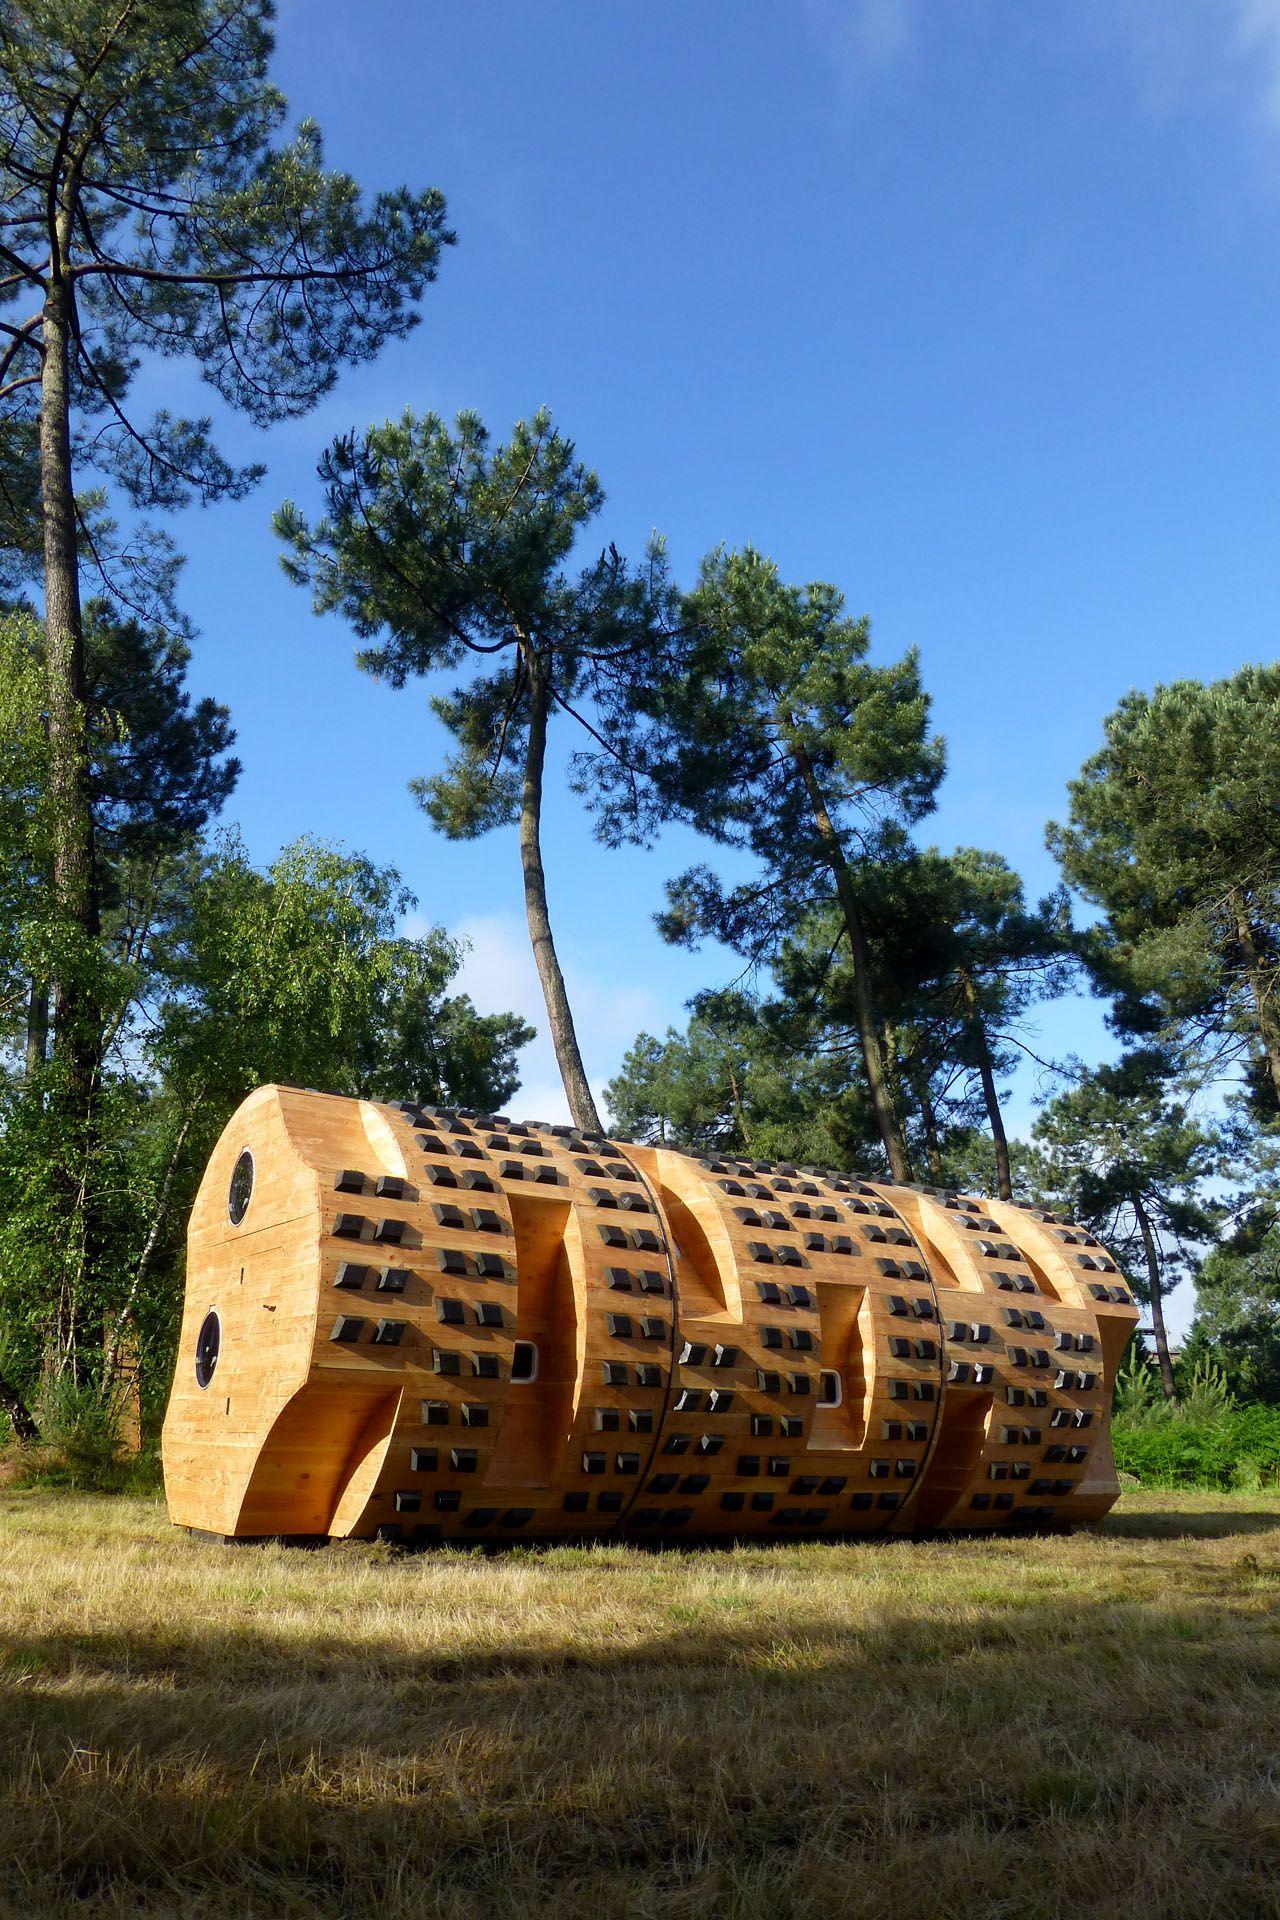 Bruit Frigo bruit du frigo - arts & aménagement des territoires